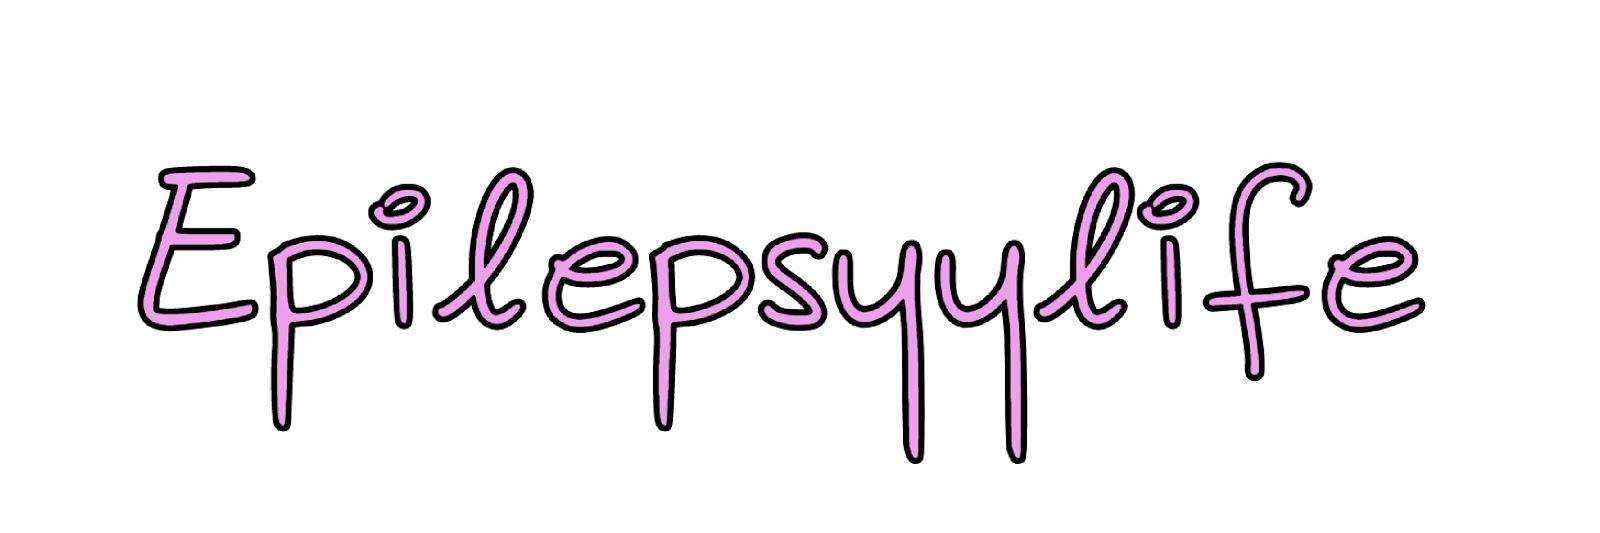 Epilepsyylife